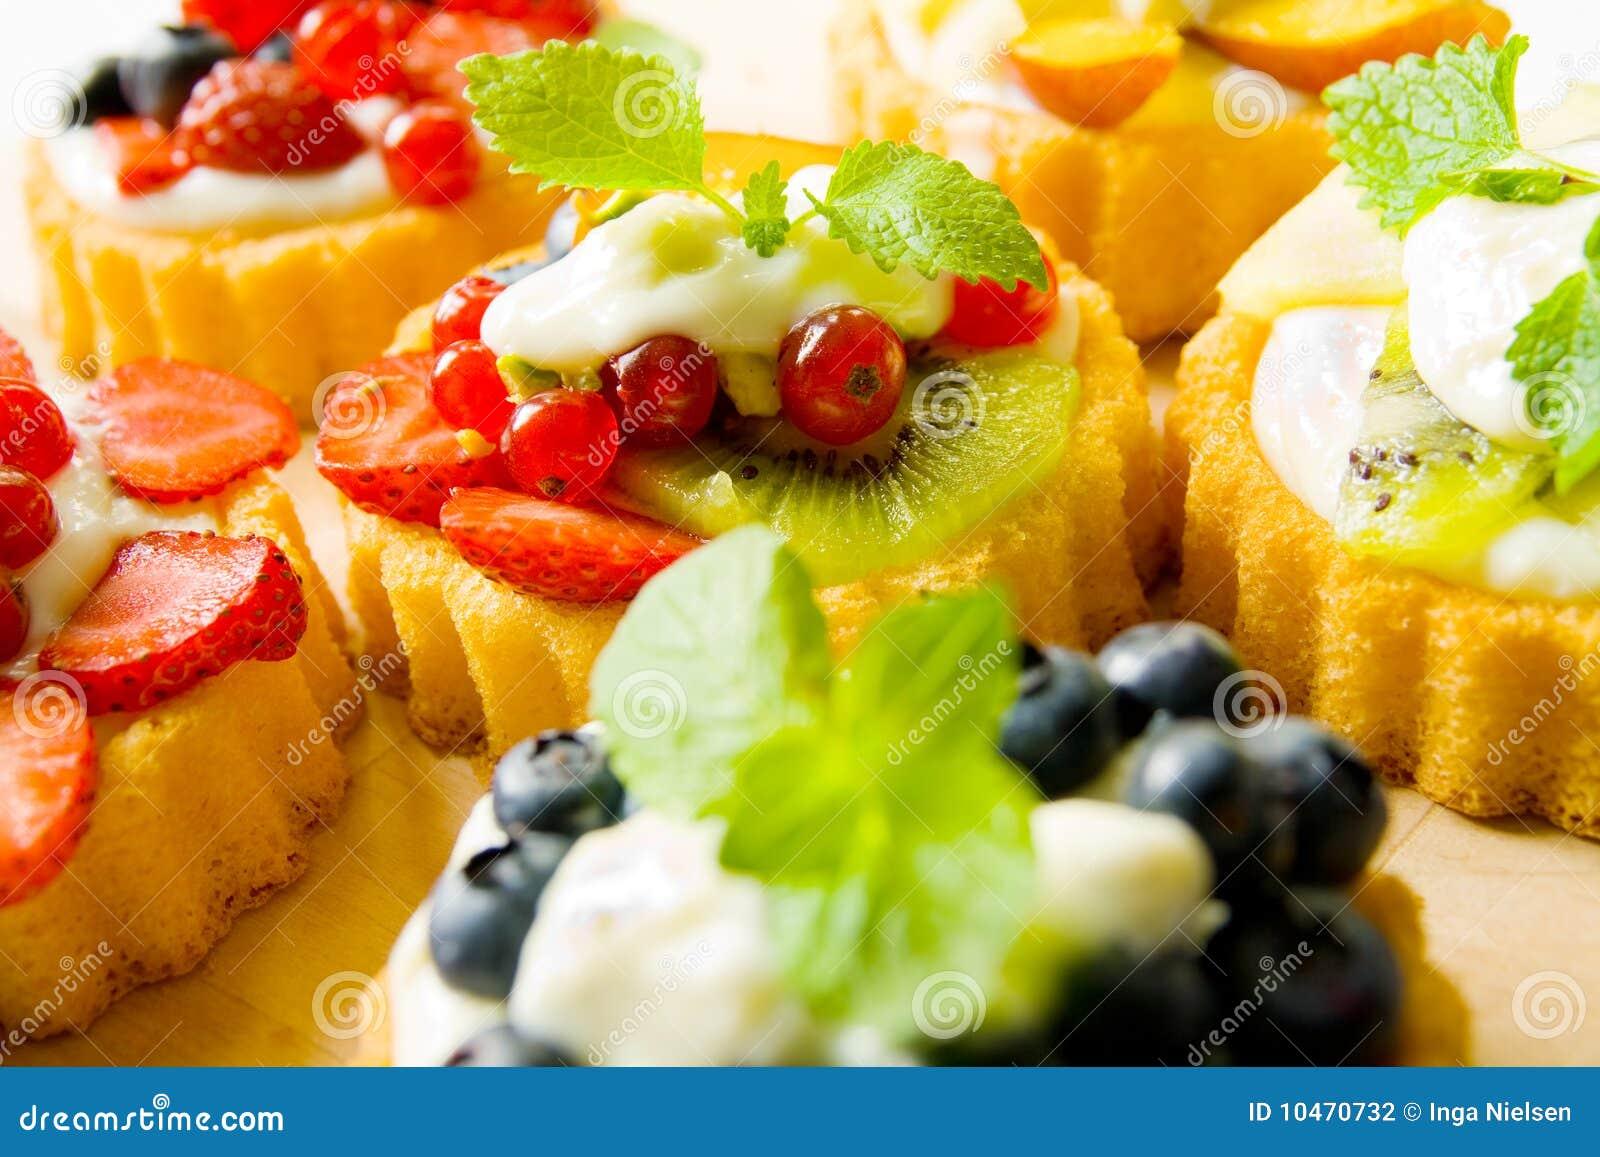 Biscuit tarts stock photo. Image of fruit, garnished